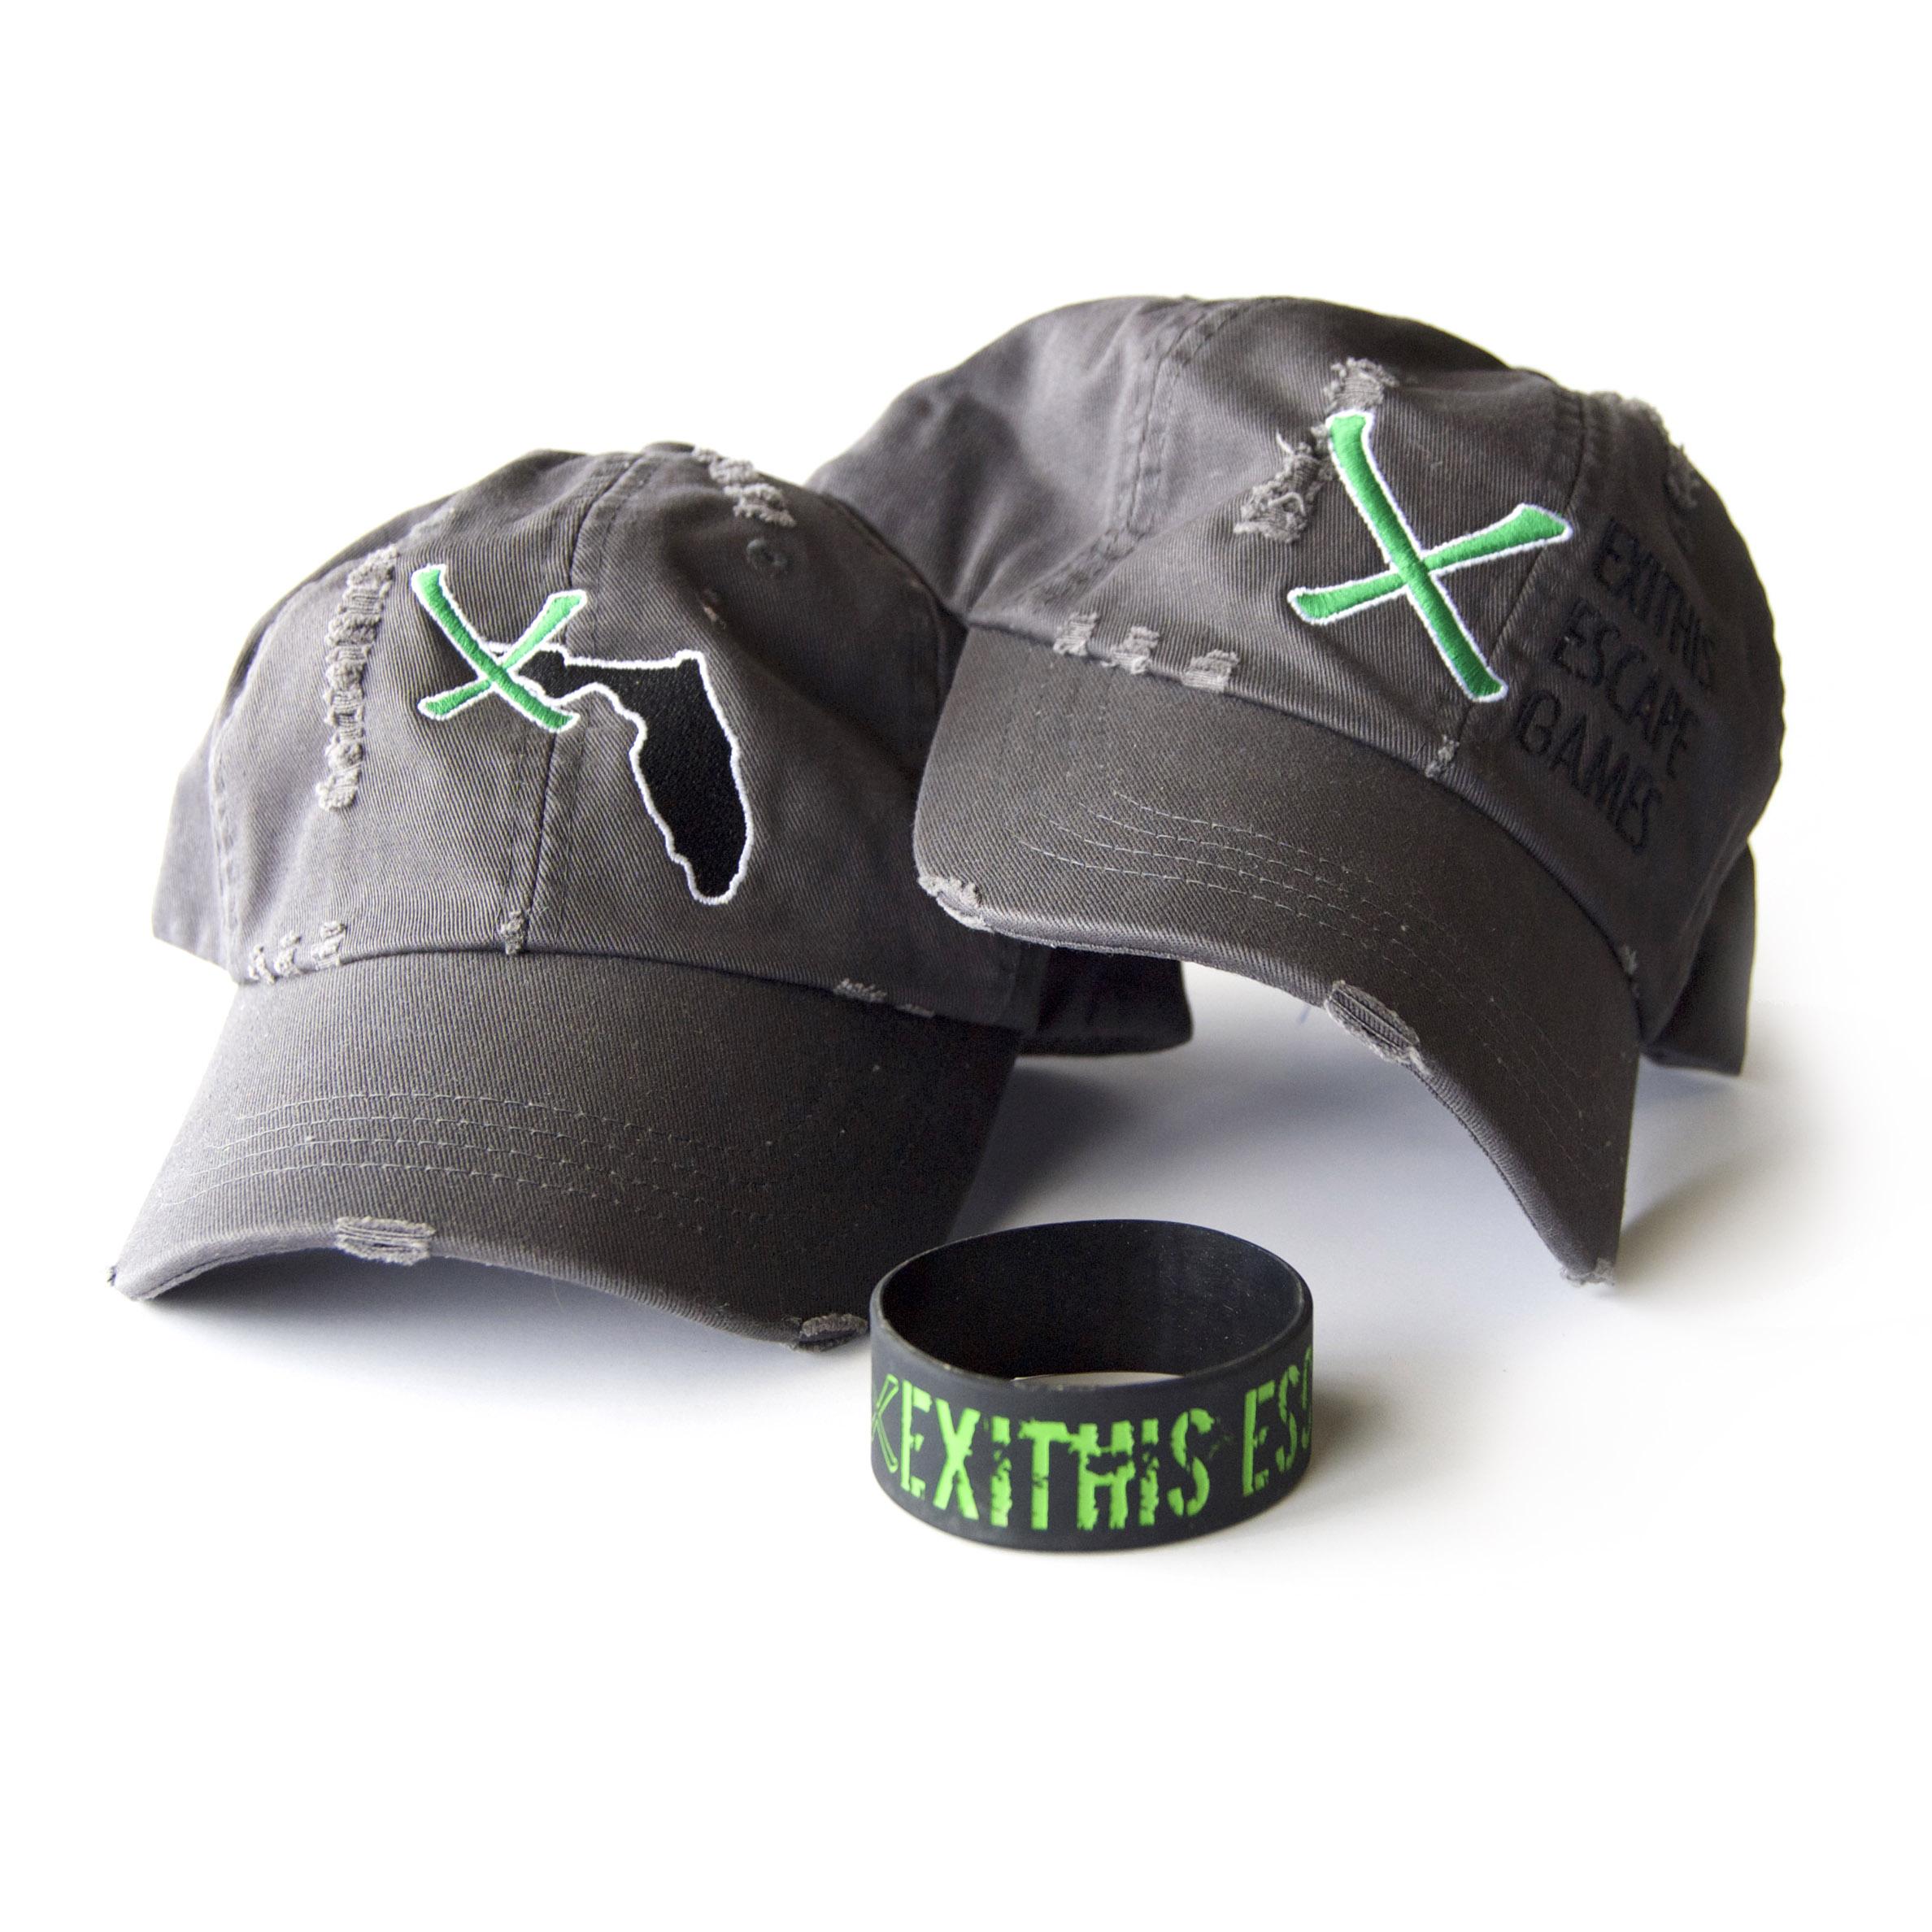 pensacola hats.jpg